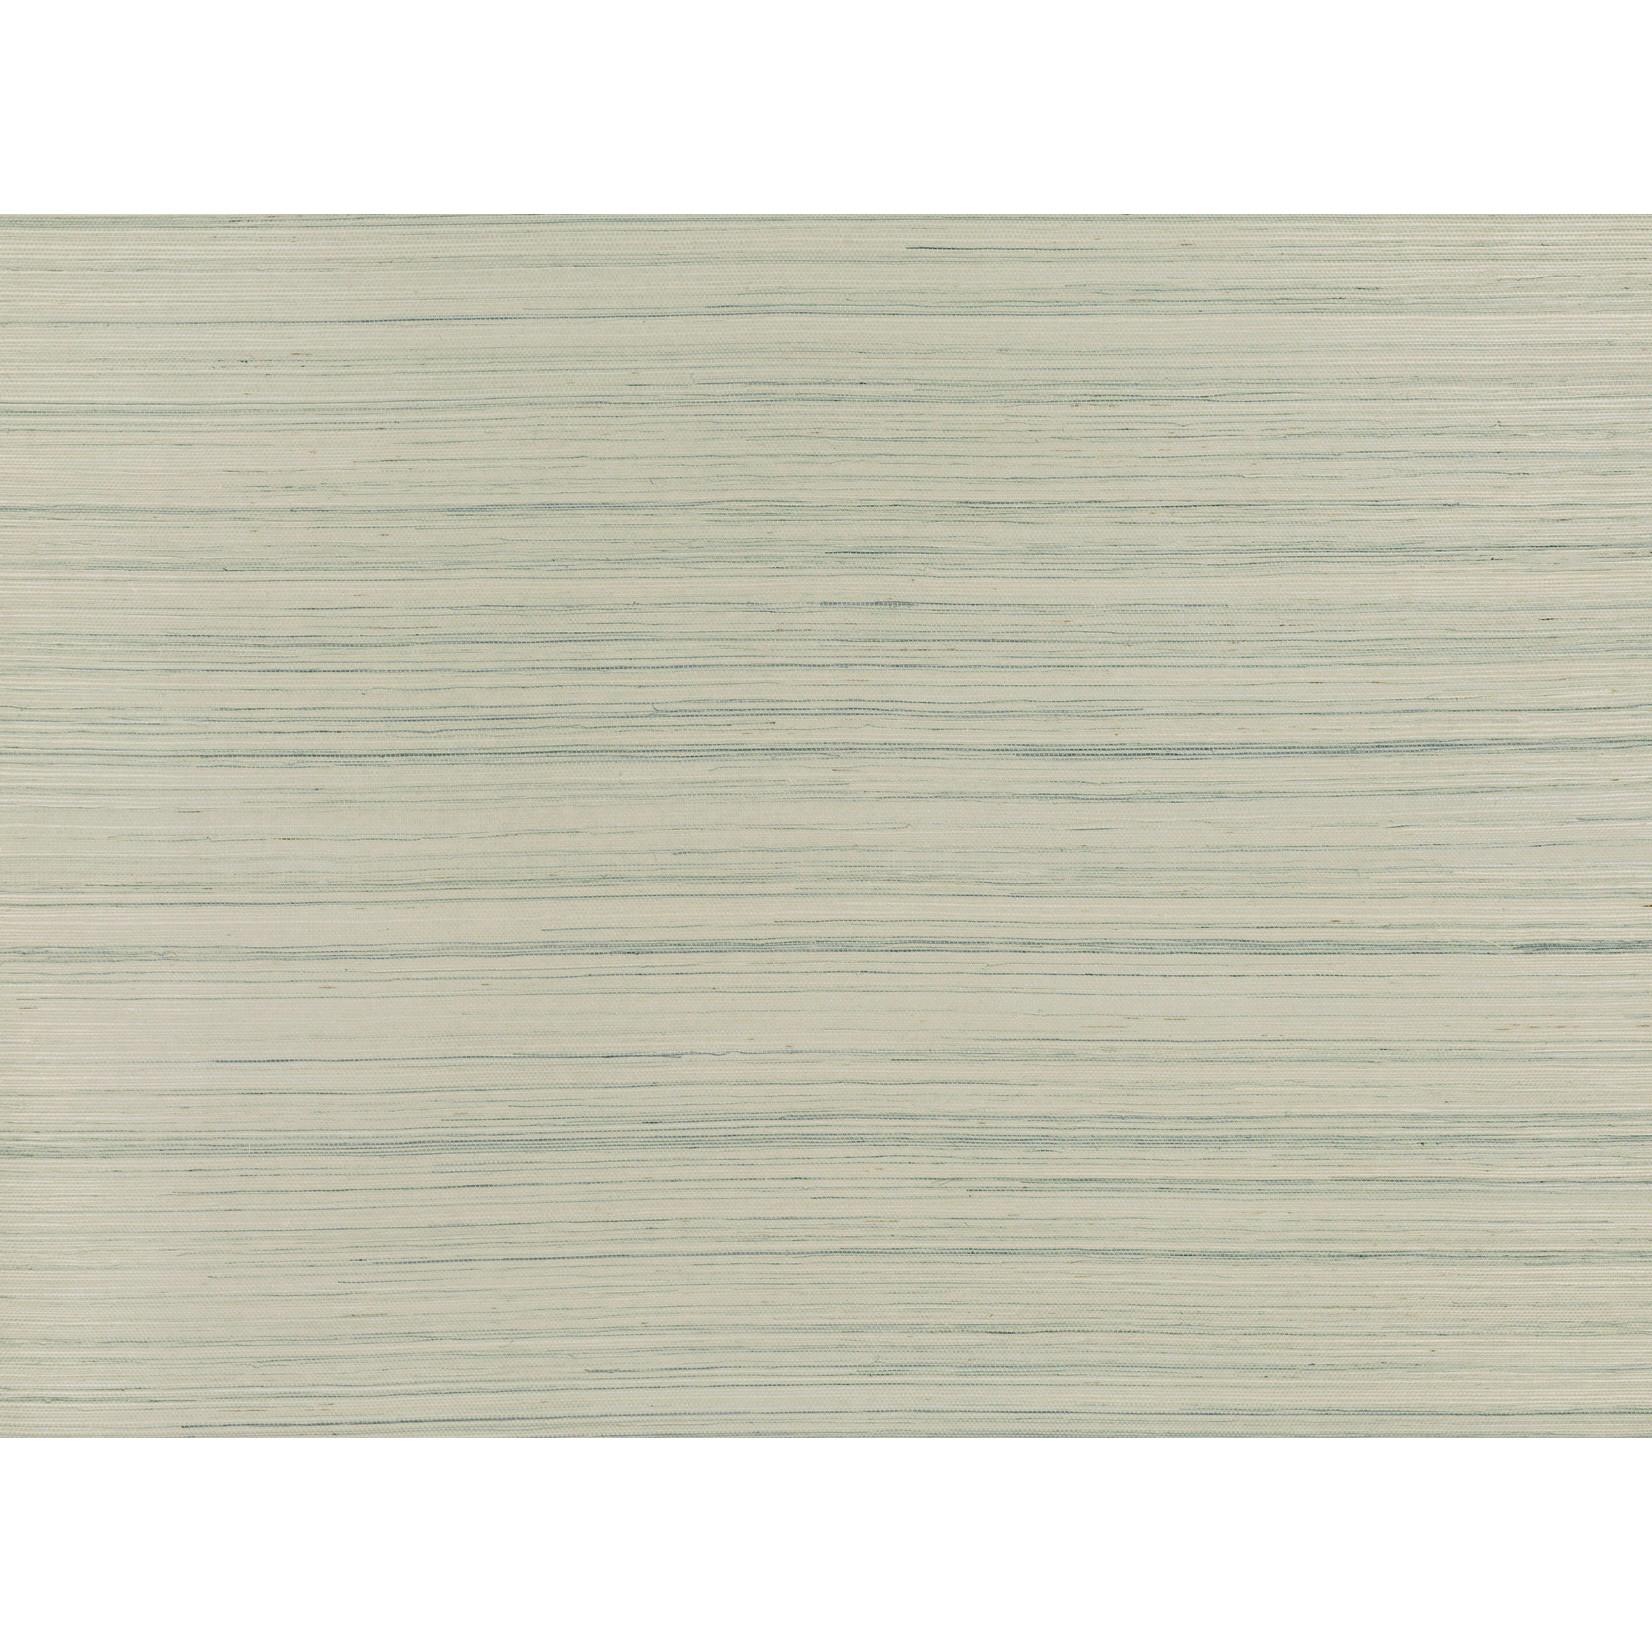 Mark Alexander Grasscloth Handwoven Wallcoverings | Duo Sisal Seasalt